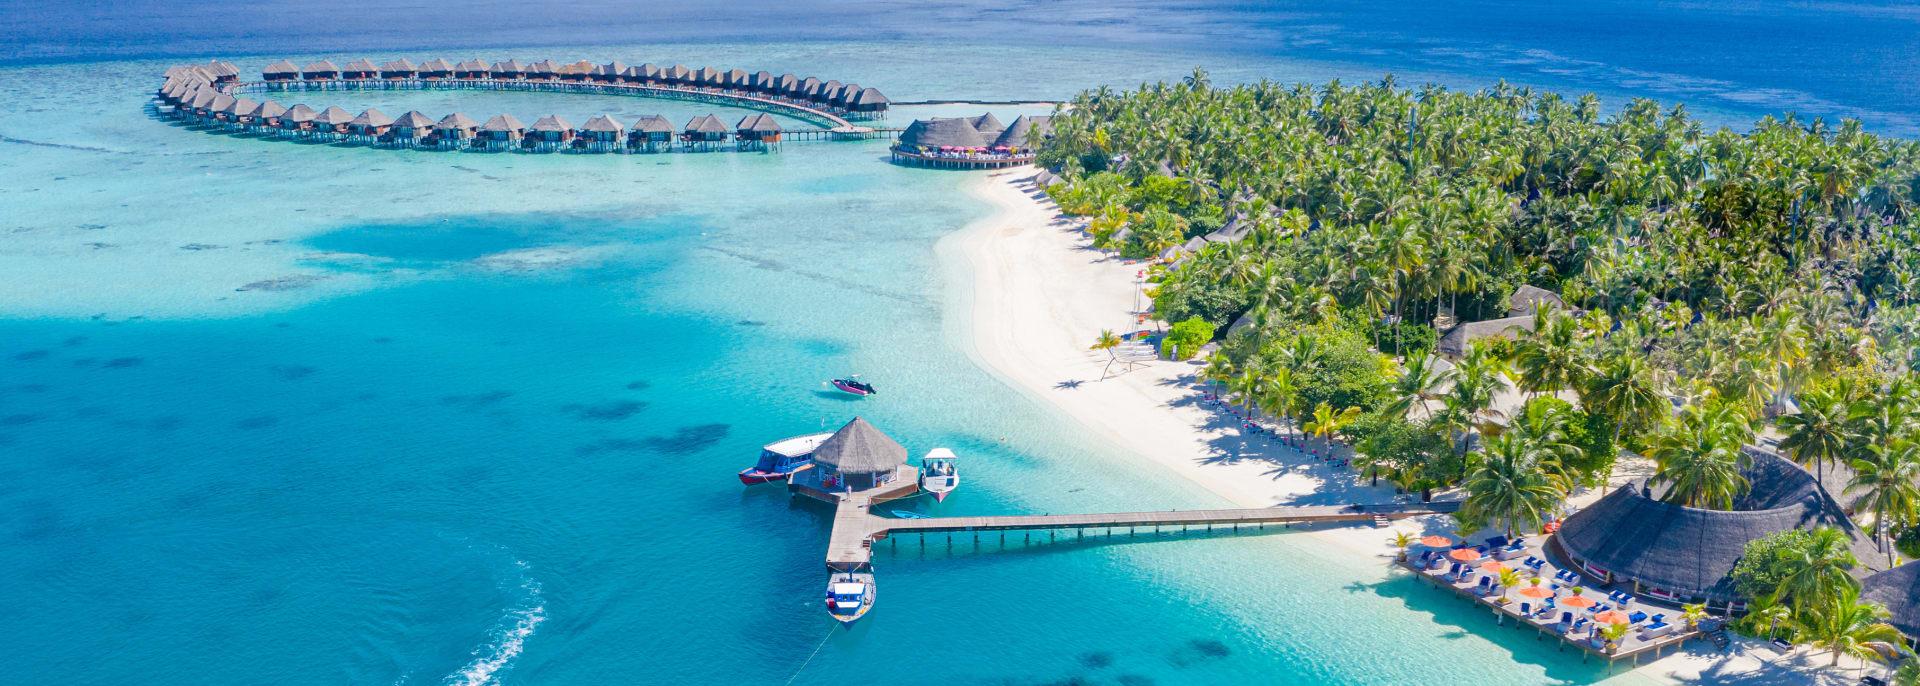 Süd Ari, Malediven